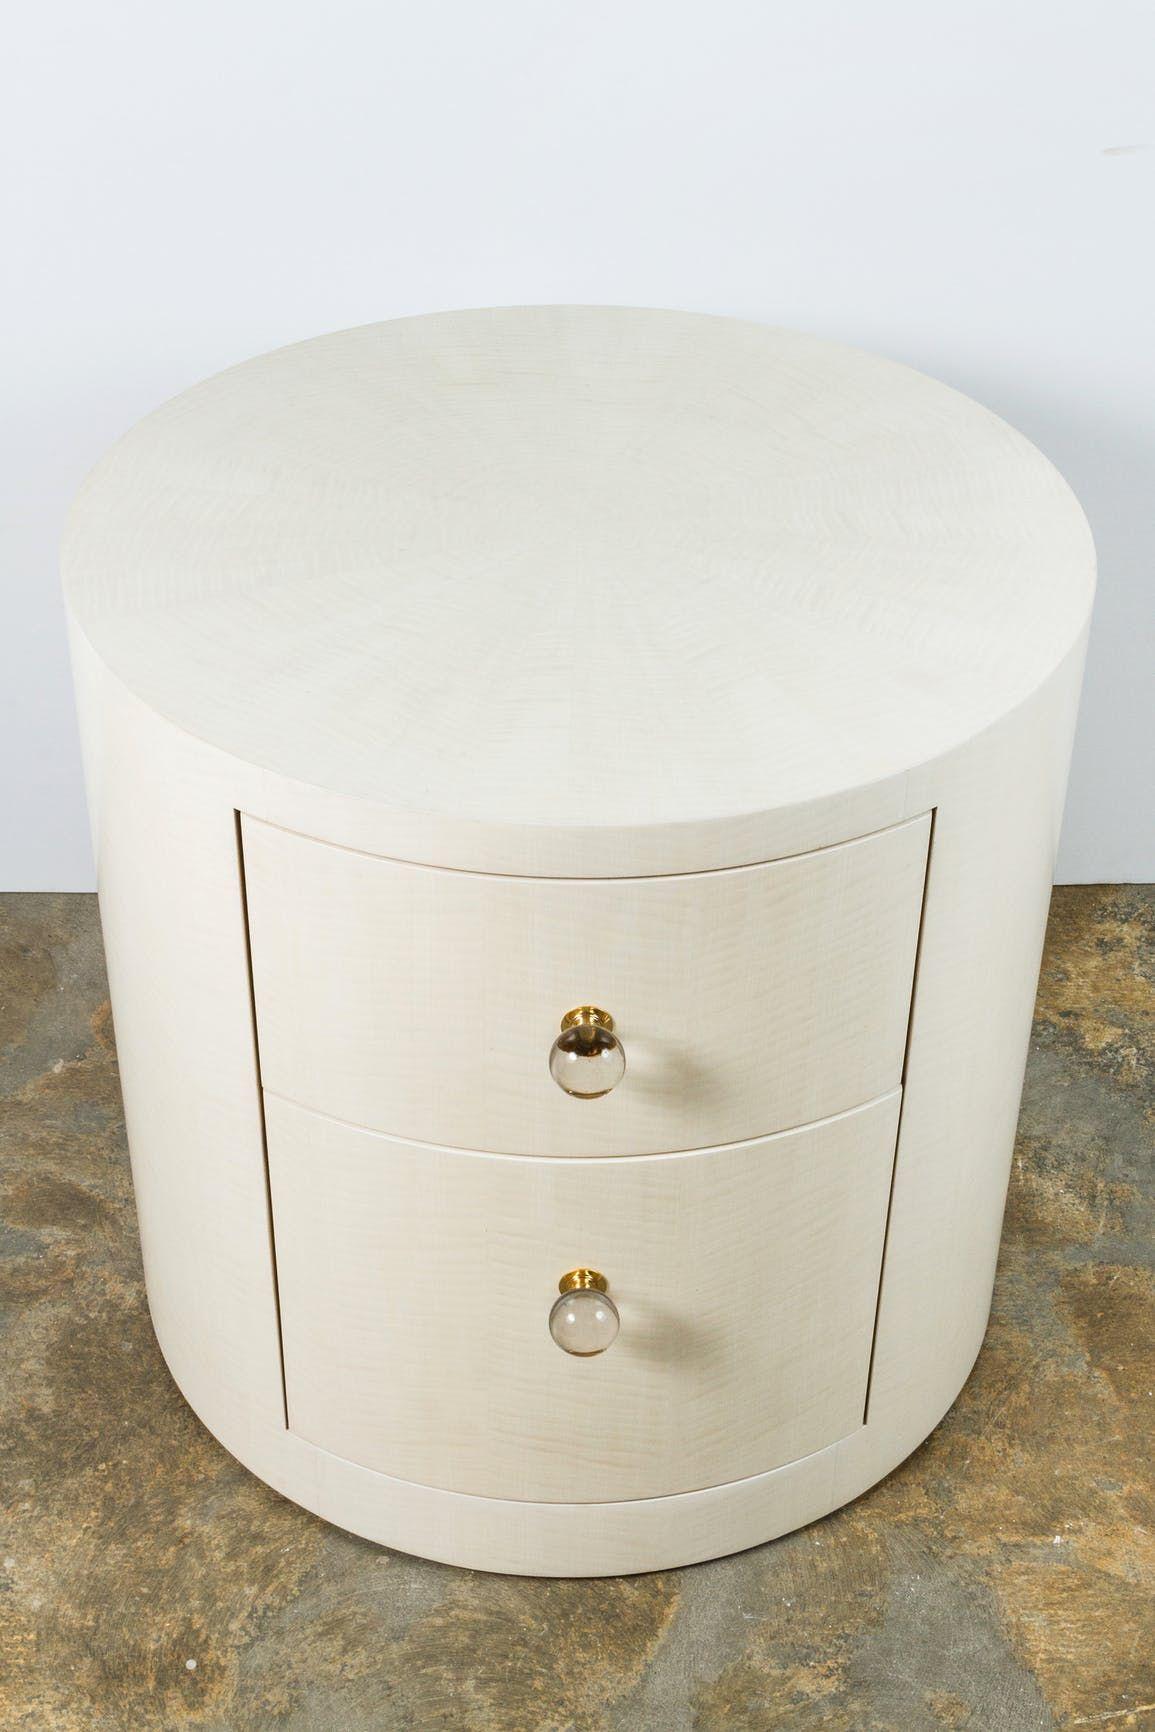 Buy Italian Inspired 1970s Style Round Nightstand by Paul Marra